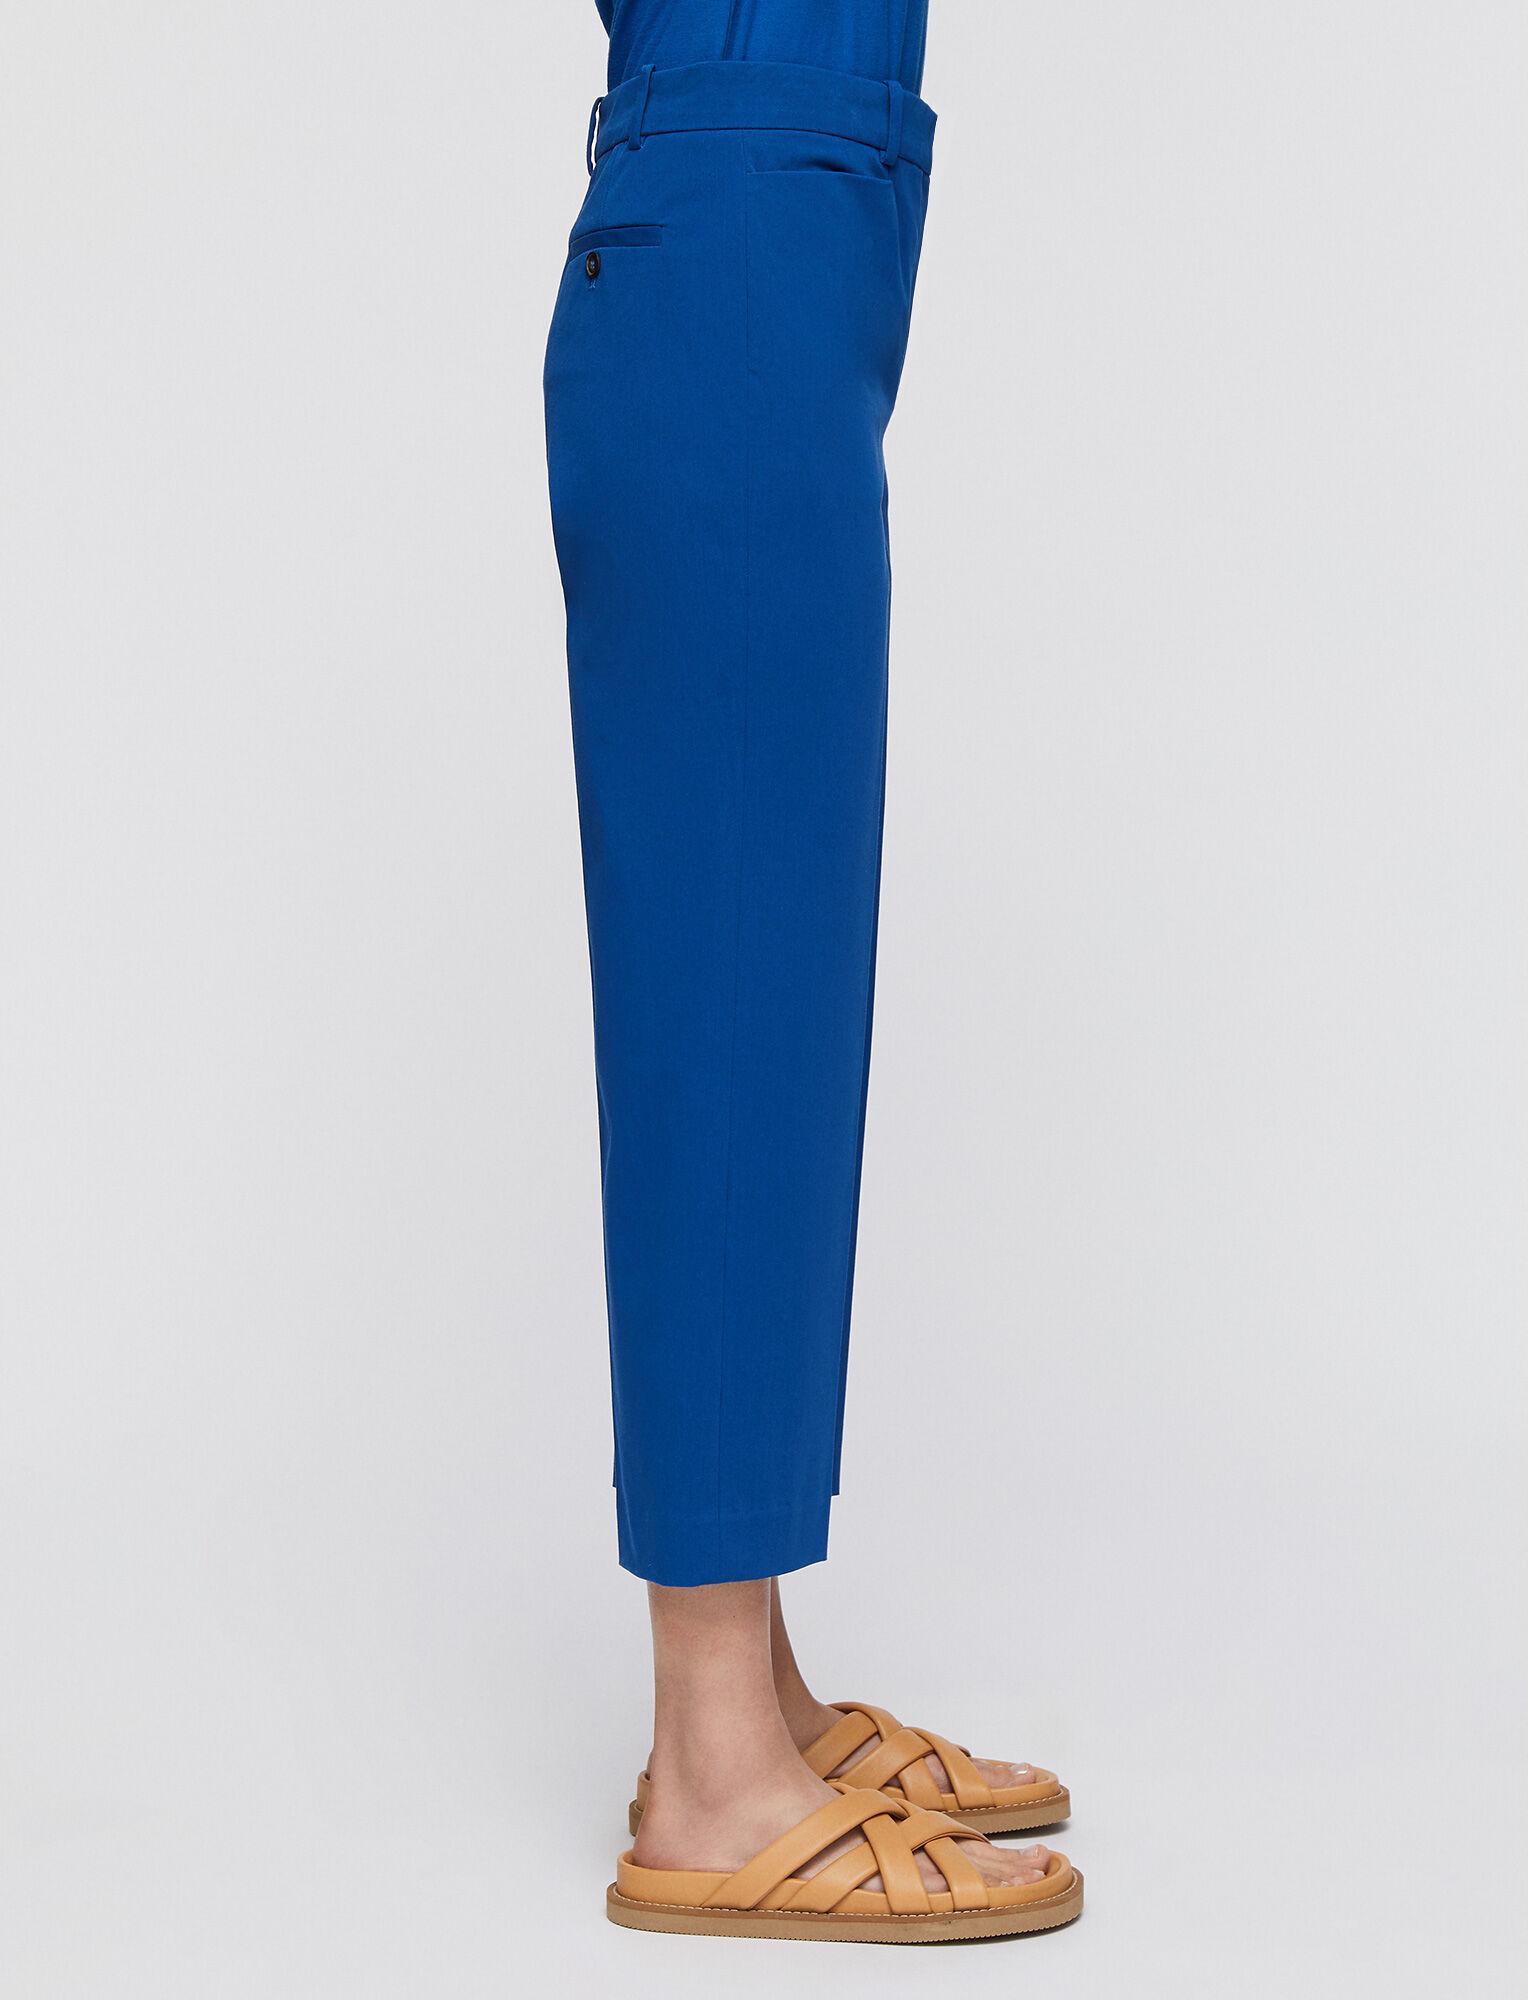 Joseph, Cotton Stretch Sloe Trousers, in MAJORELLE